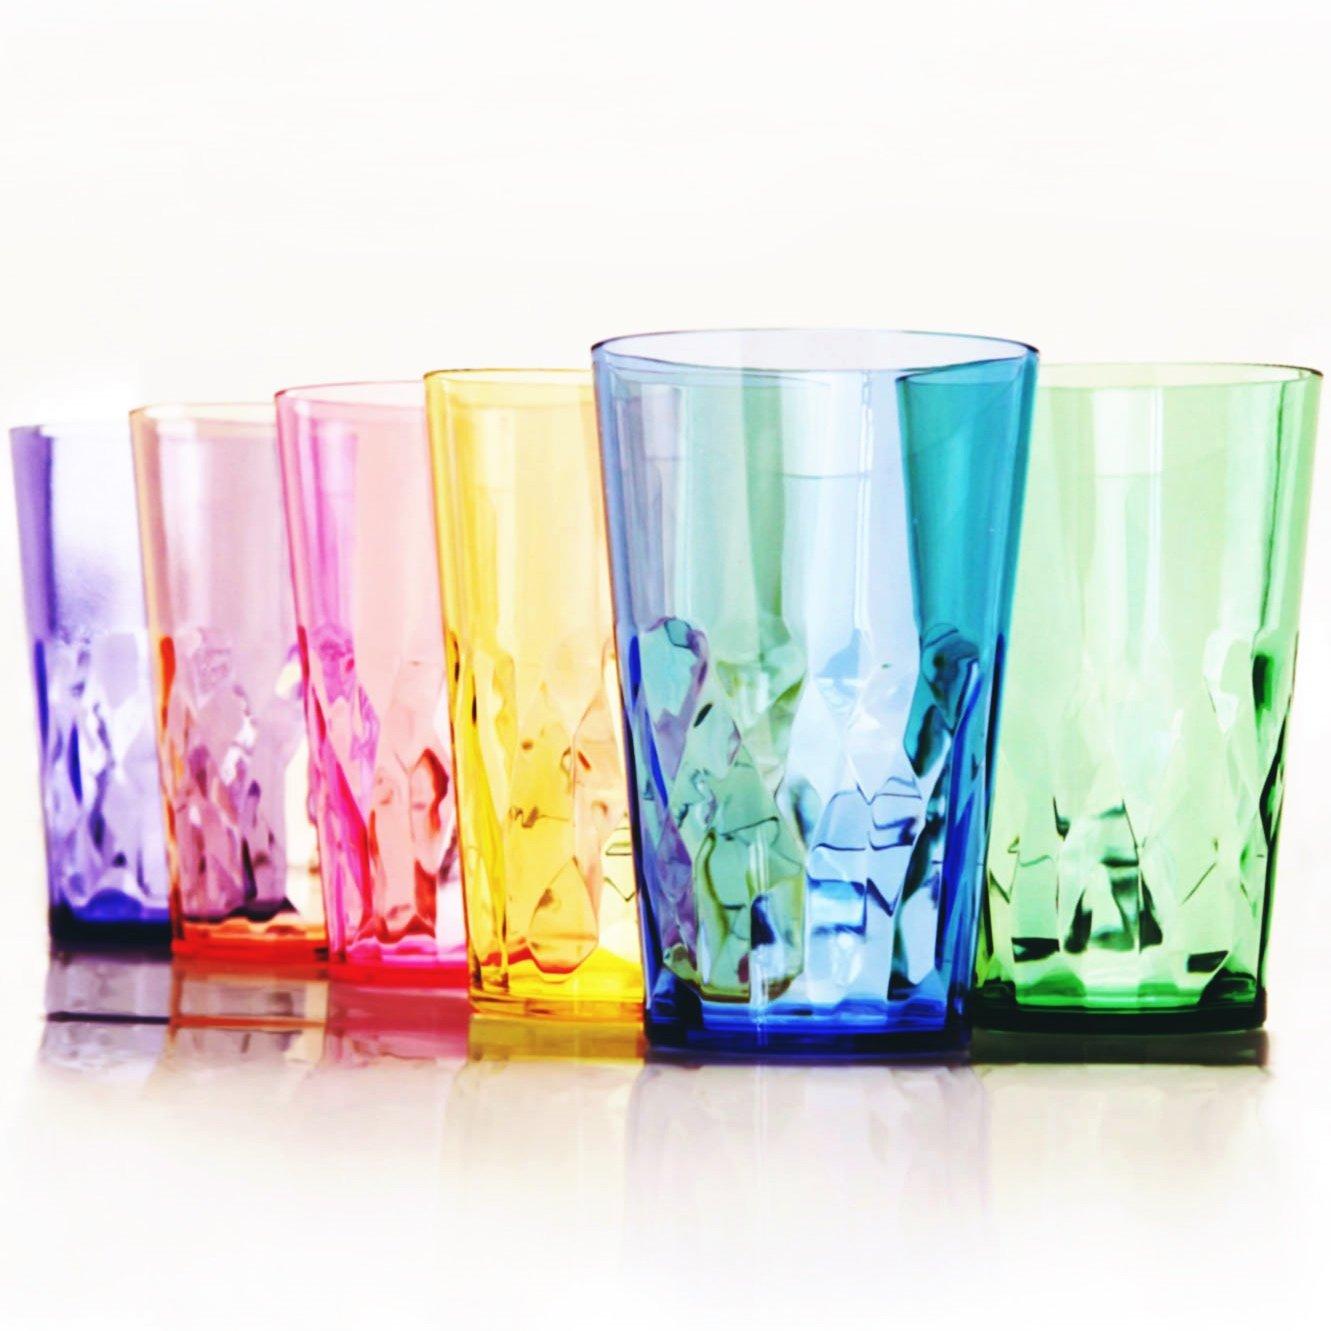 19 oz Premium Drinking Glasses - Set of 6 - Unbreakable Tritan Plastic - BPA Free - 100% Made in Japan (Assorted Colors) CT-21